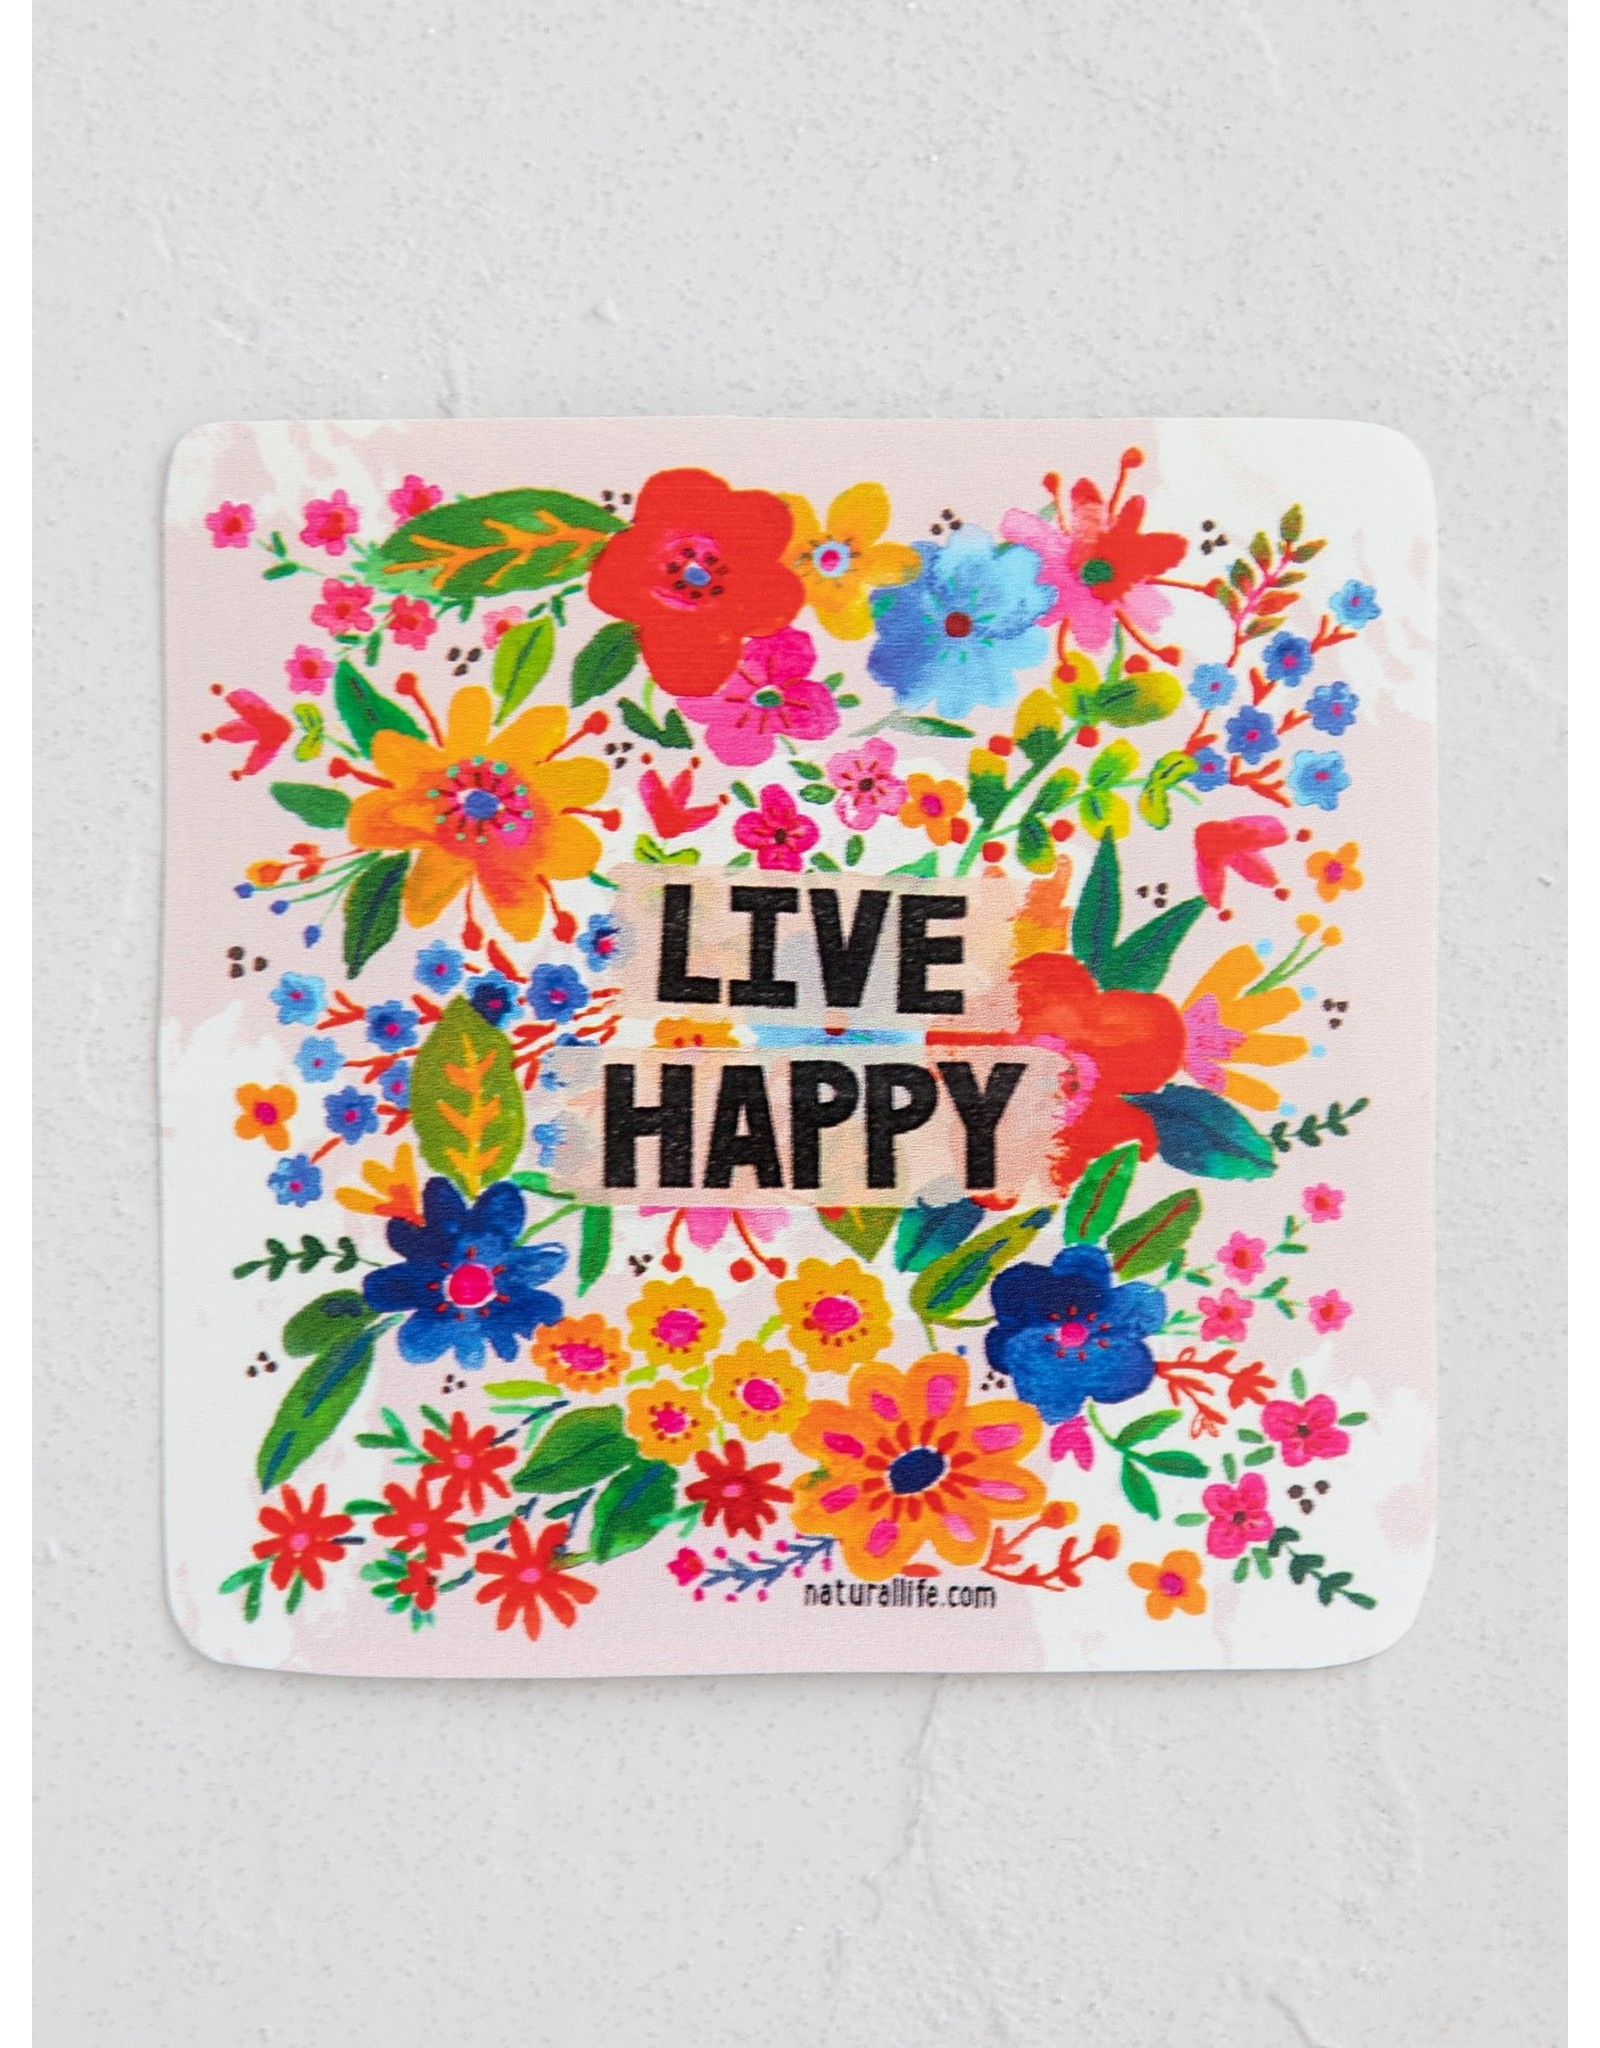 Natural LIfe Vinyl Sticker, Live Happy Floral